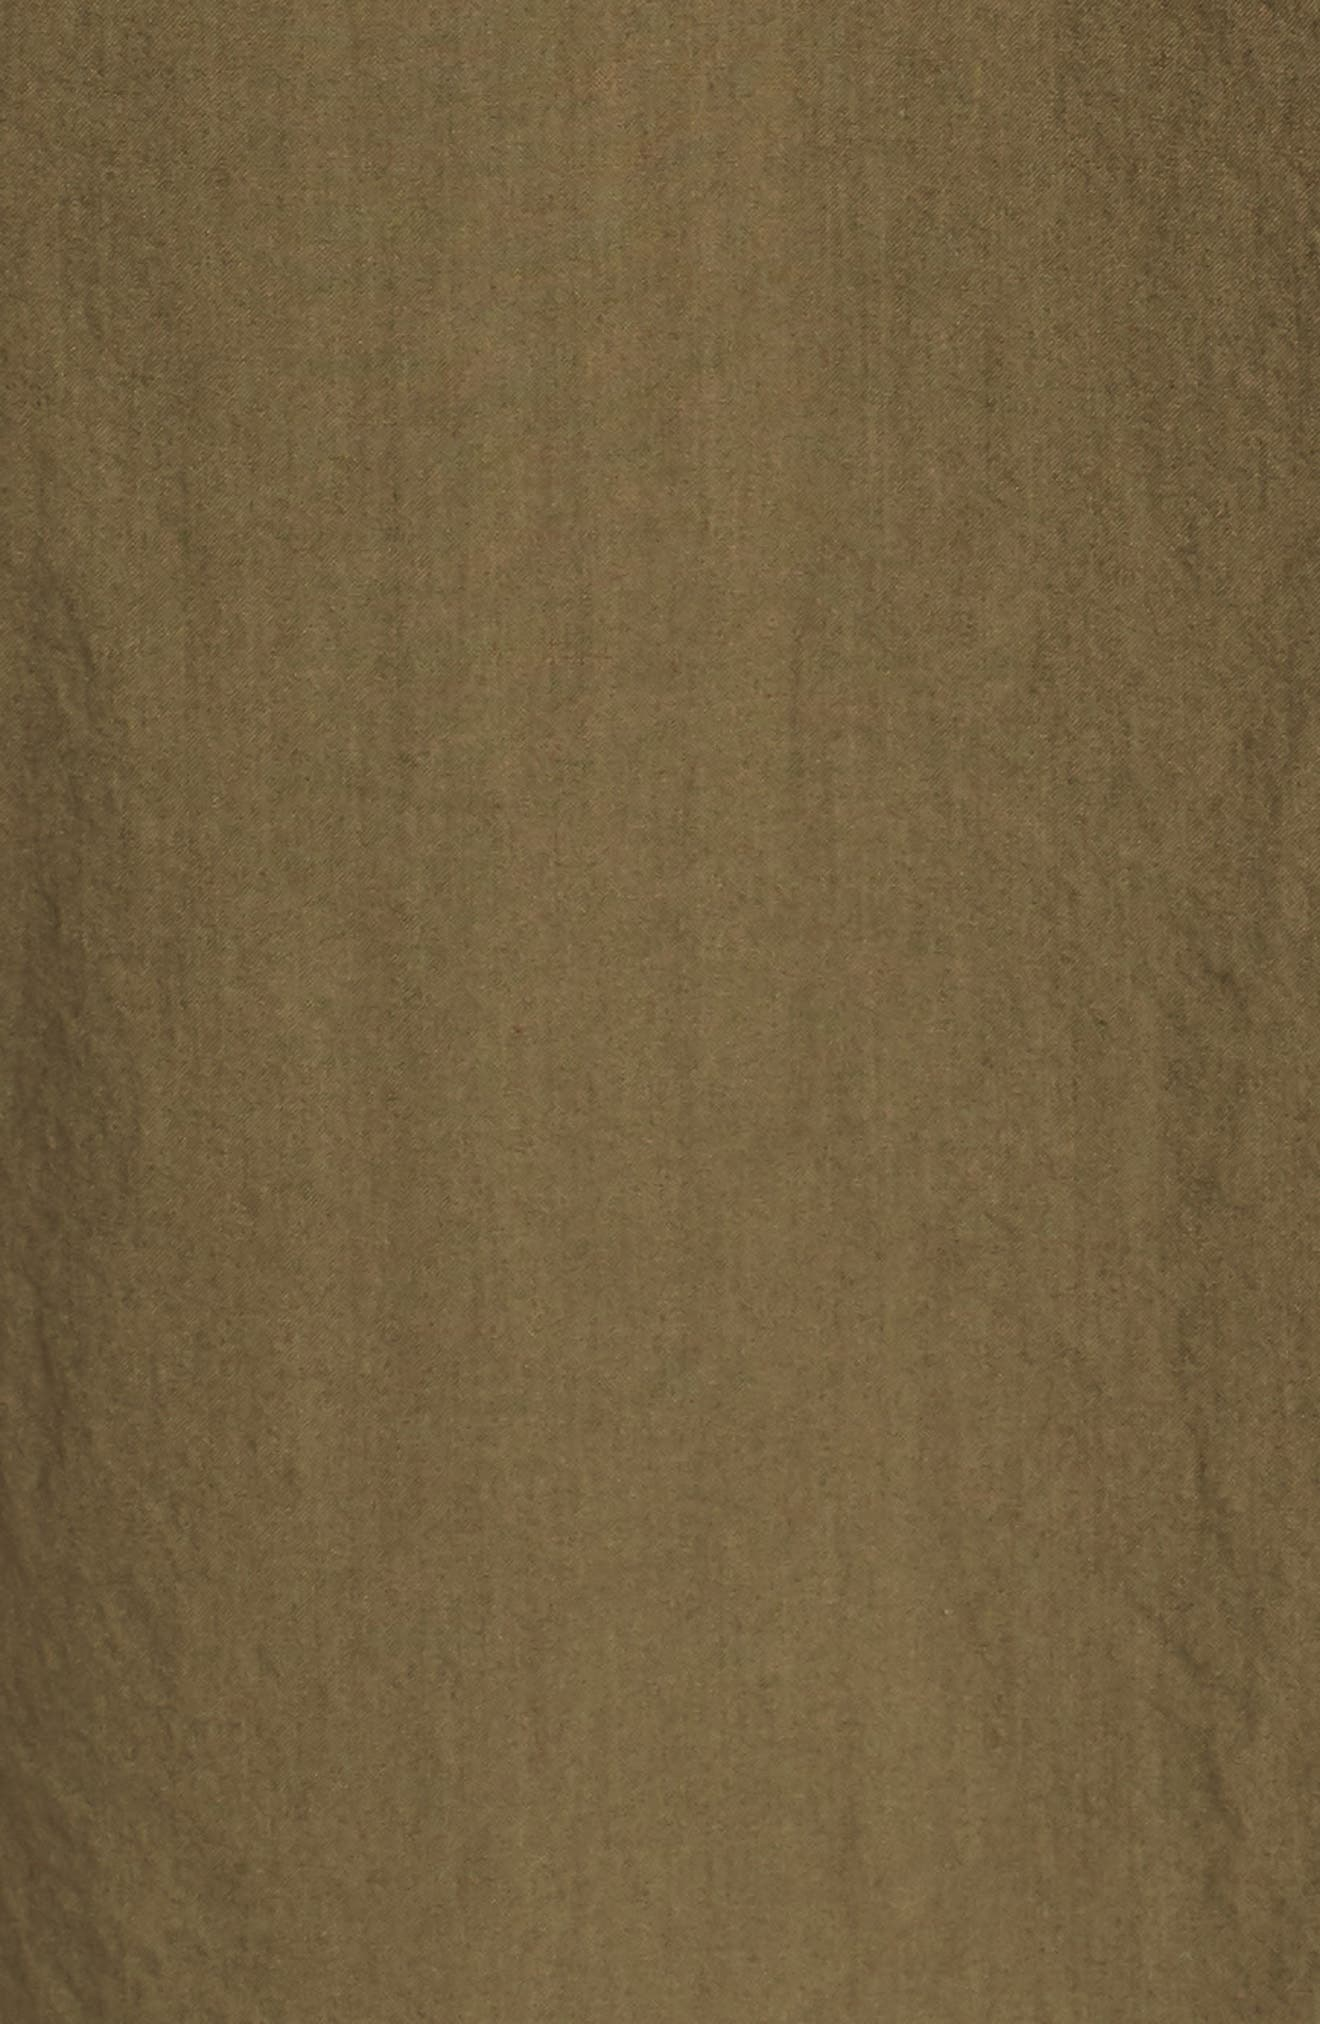 Brantley Slim Fit Sport Shirt,                             Alternate thumbnail 5, color,                             300